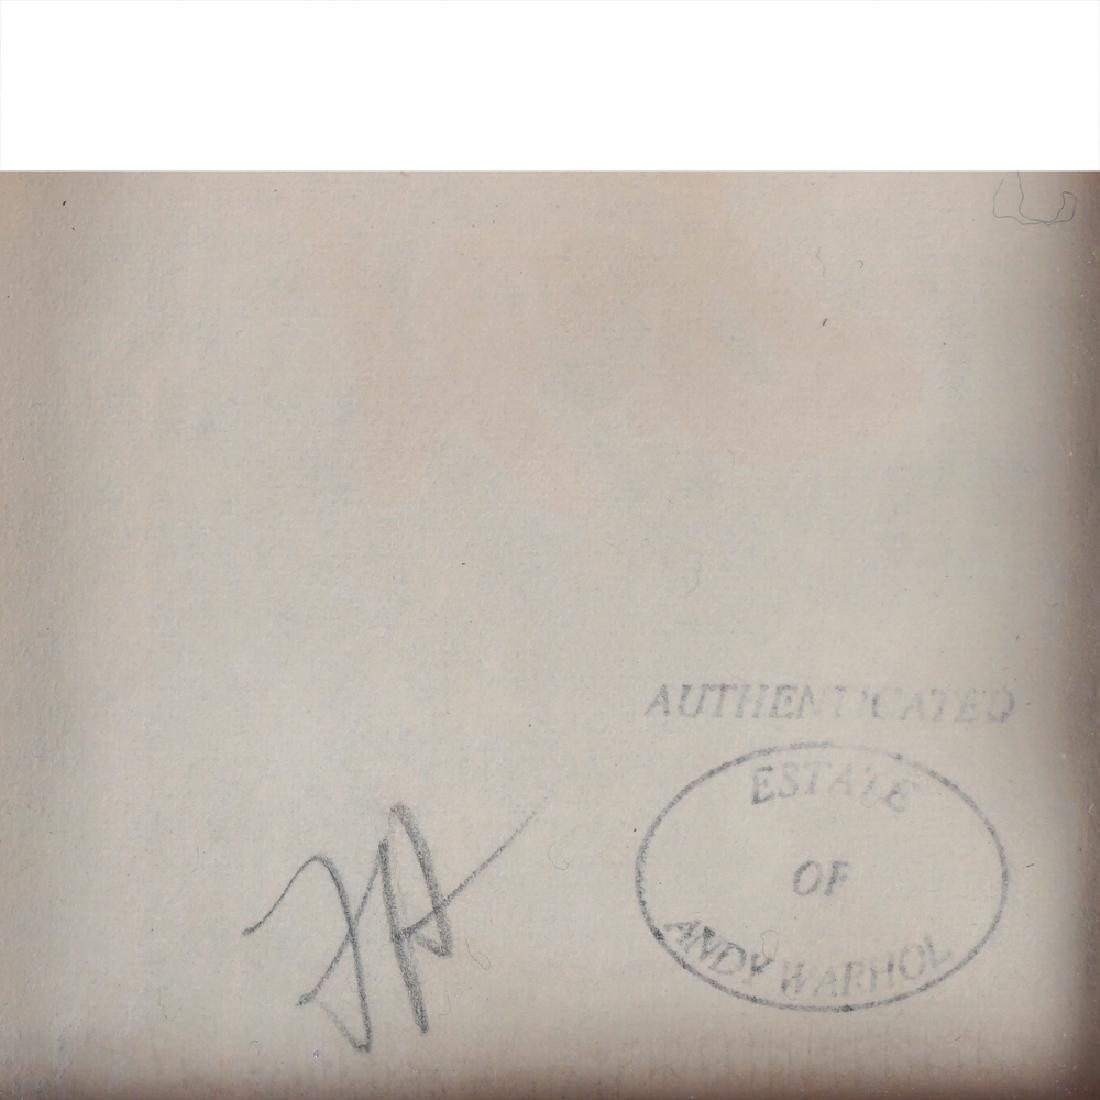 Andy Warhol Pittsburgh 1928 1928 - New York 1987 - 2